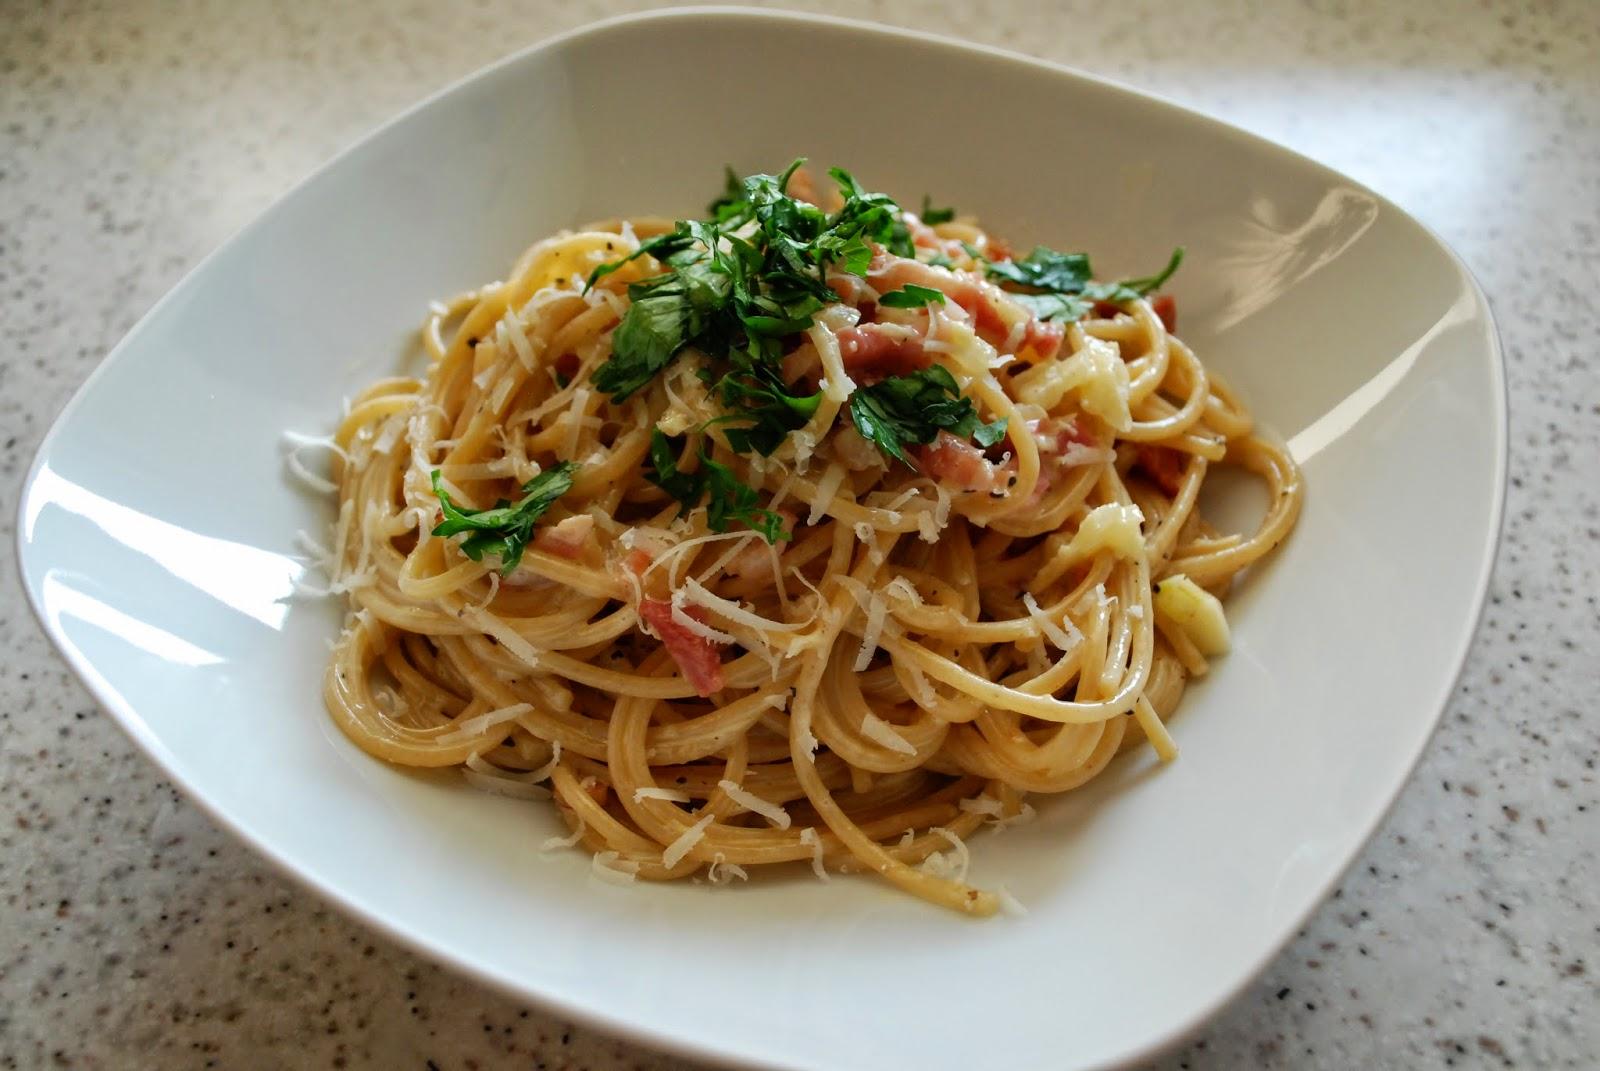 Spaghetti alla carbonara www.niebonajezykach.blogspot.com